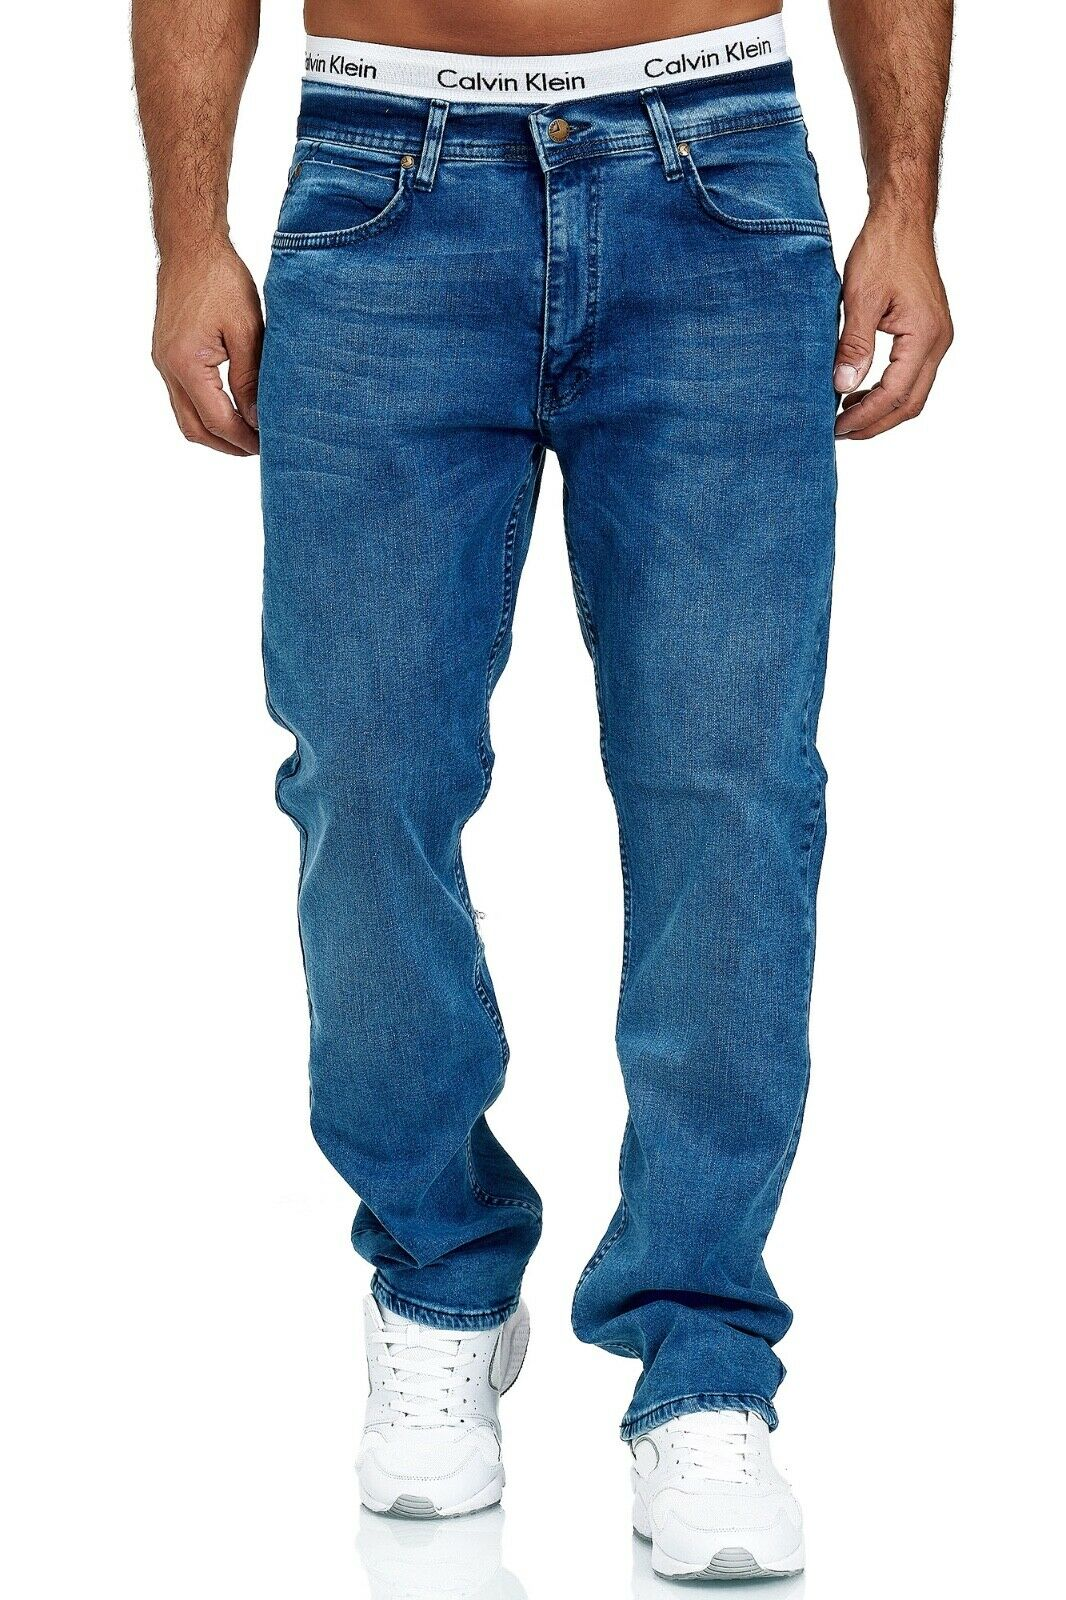 Herren-Jeans-Hose-Denim-KC-Black-Washed-Straight-Cut-Regular-Dicke-Naht-naehte Indexbild 61